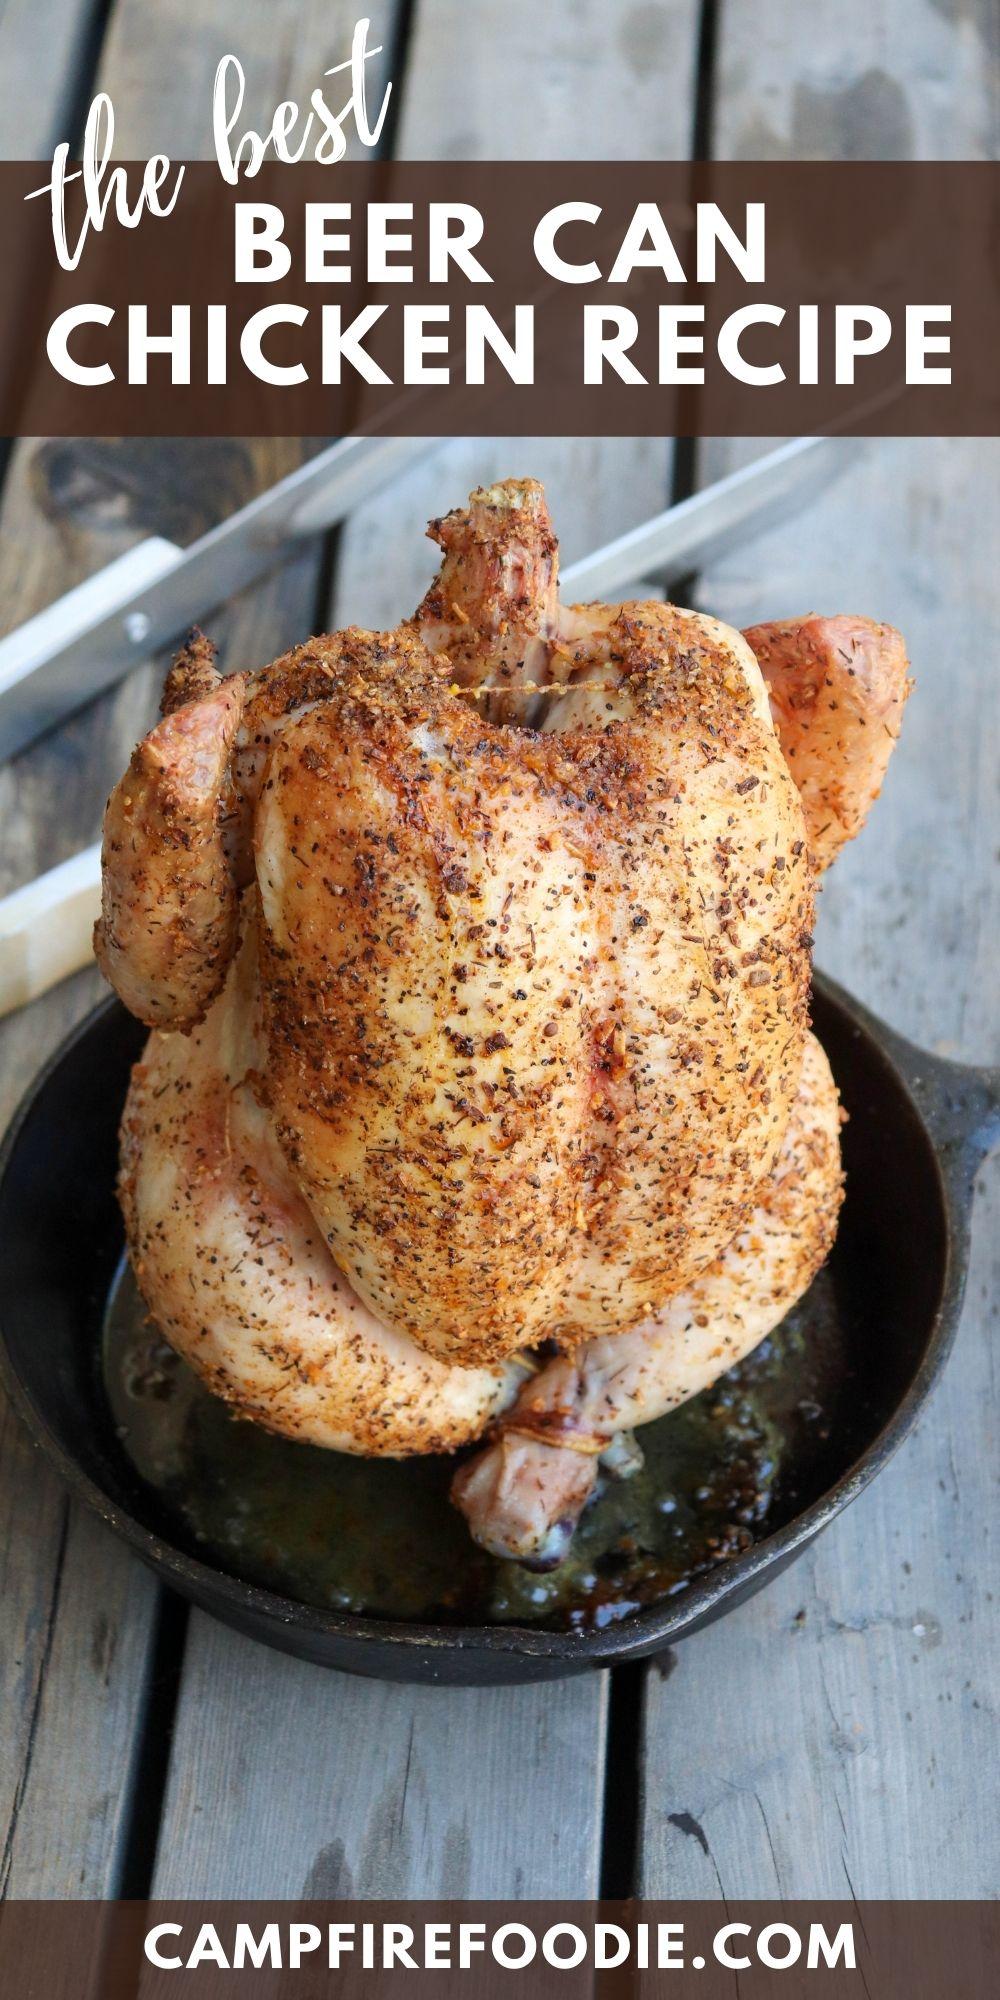 The best beer can chicken recipe